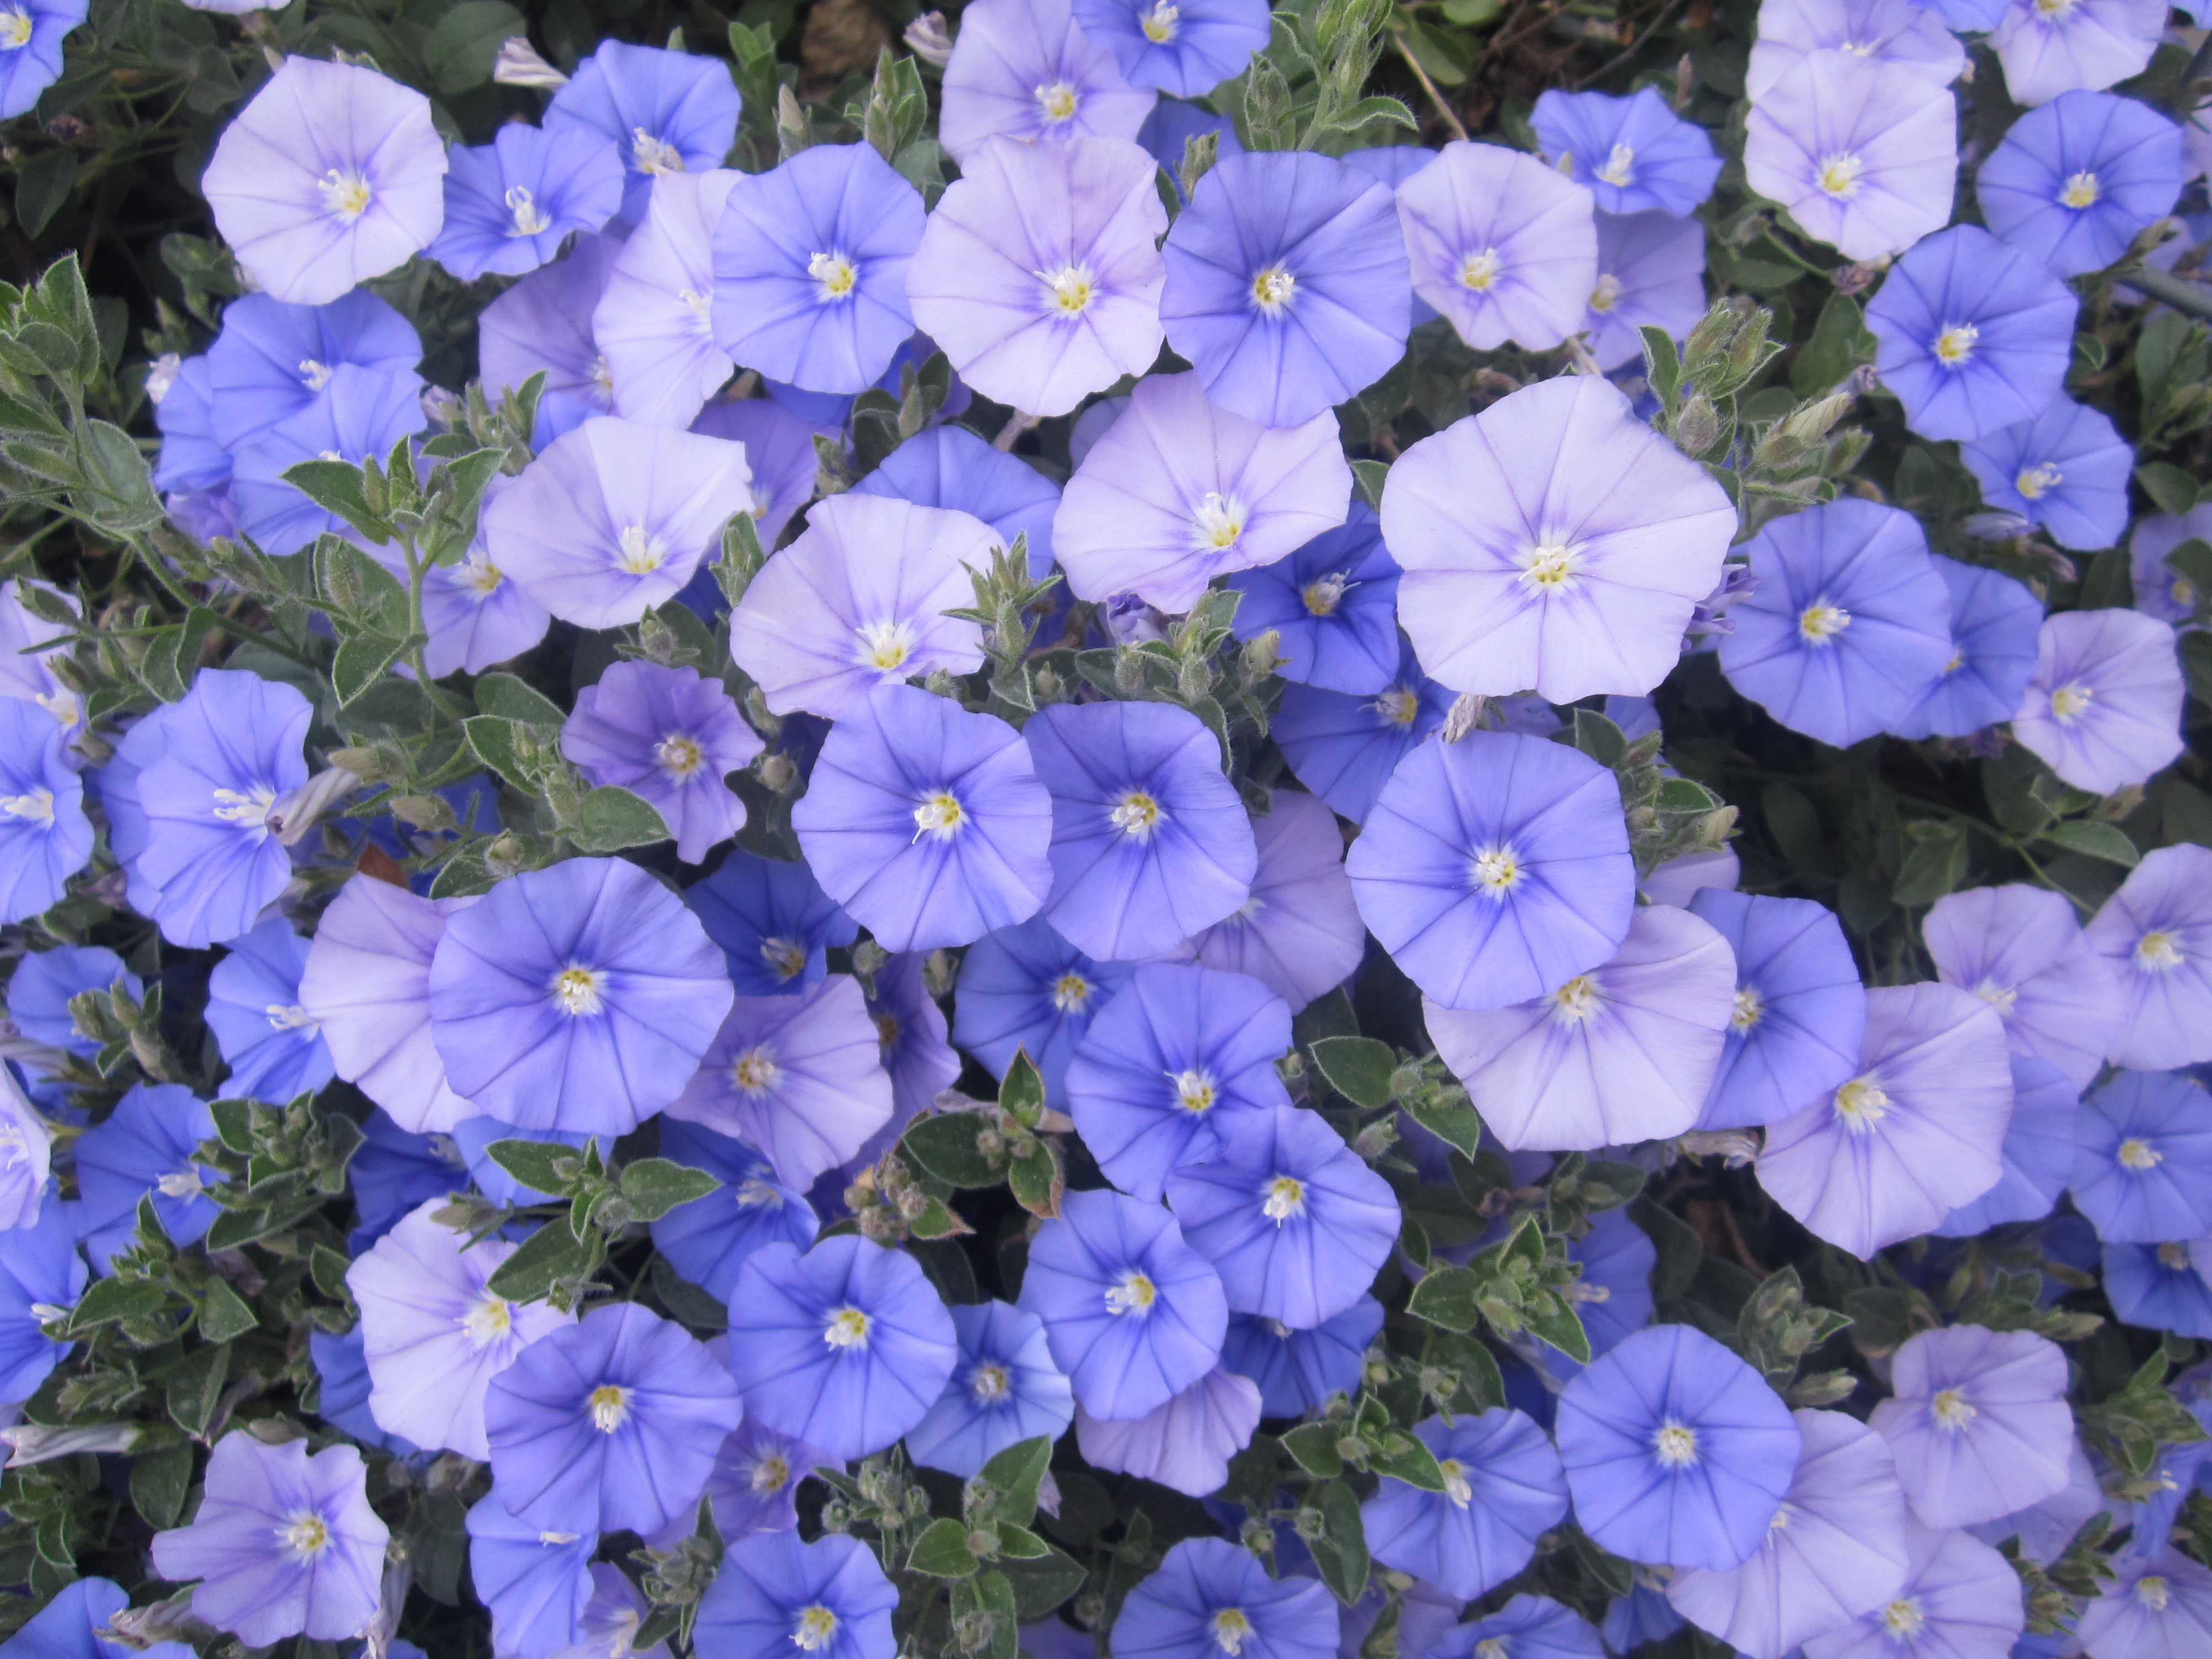 10 Outstanding Plants With Bluemauve Flowers The Smarter Gardener